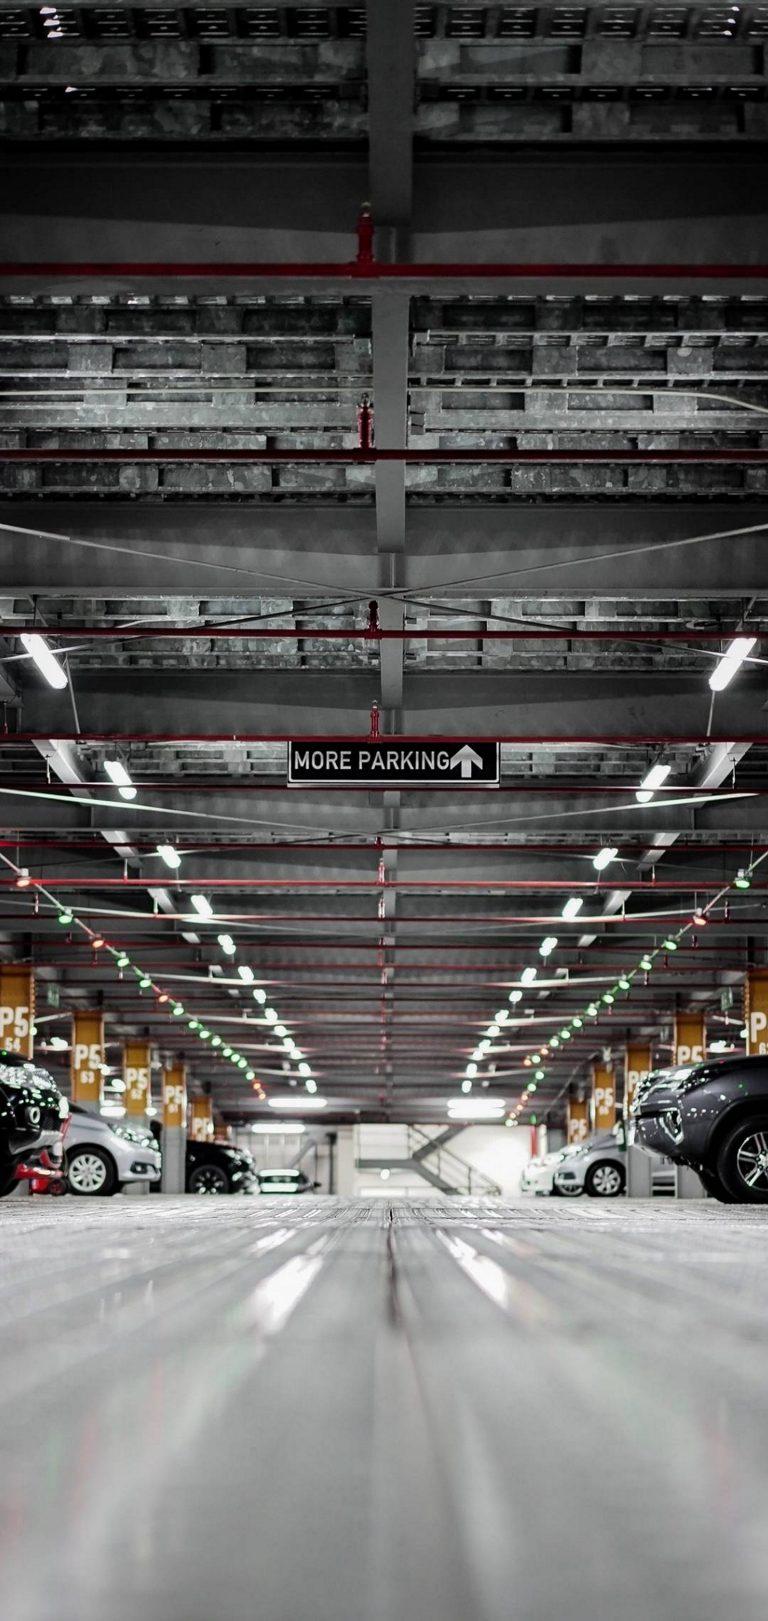 Vehicles Car Parking Wallpaper 1440x3040 768x1621